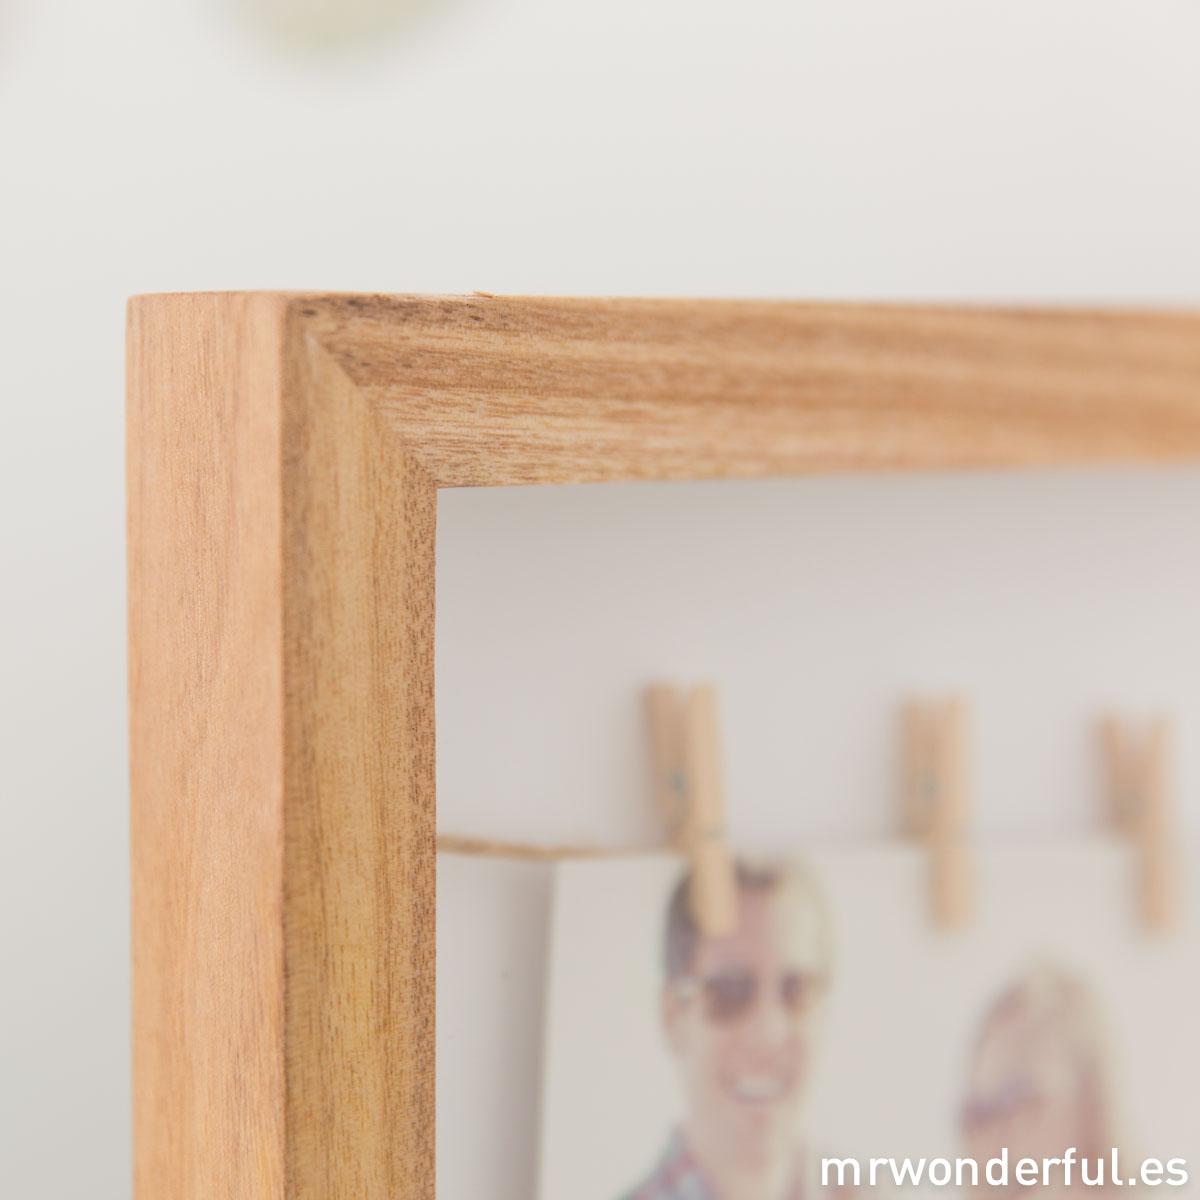 mrwonderful_umbra_PRA02904_marco-grande-madera-11